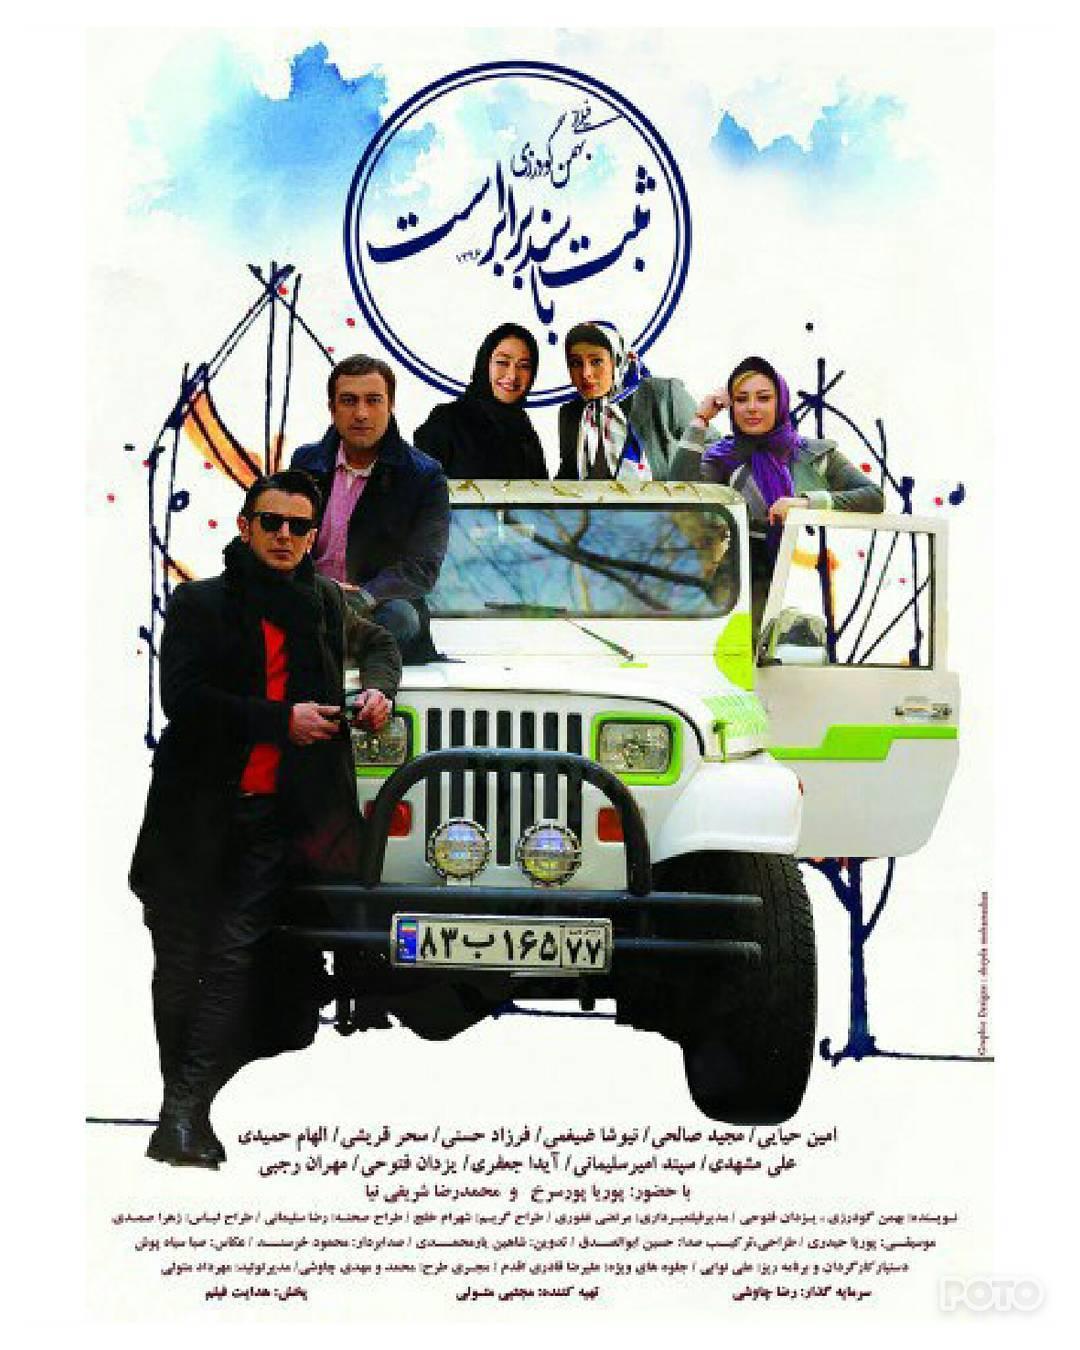 http://s8.picofile.com/file/8310279118/www_bartarpix_ir_film_sabt_ba_sanad_brabar_ast_7_.jpg